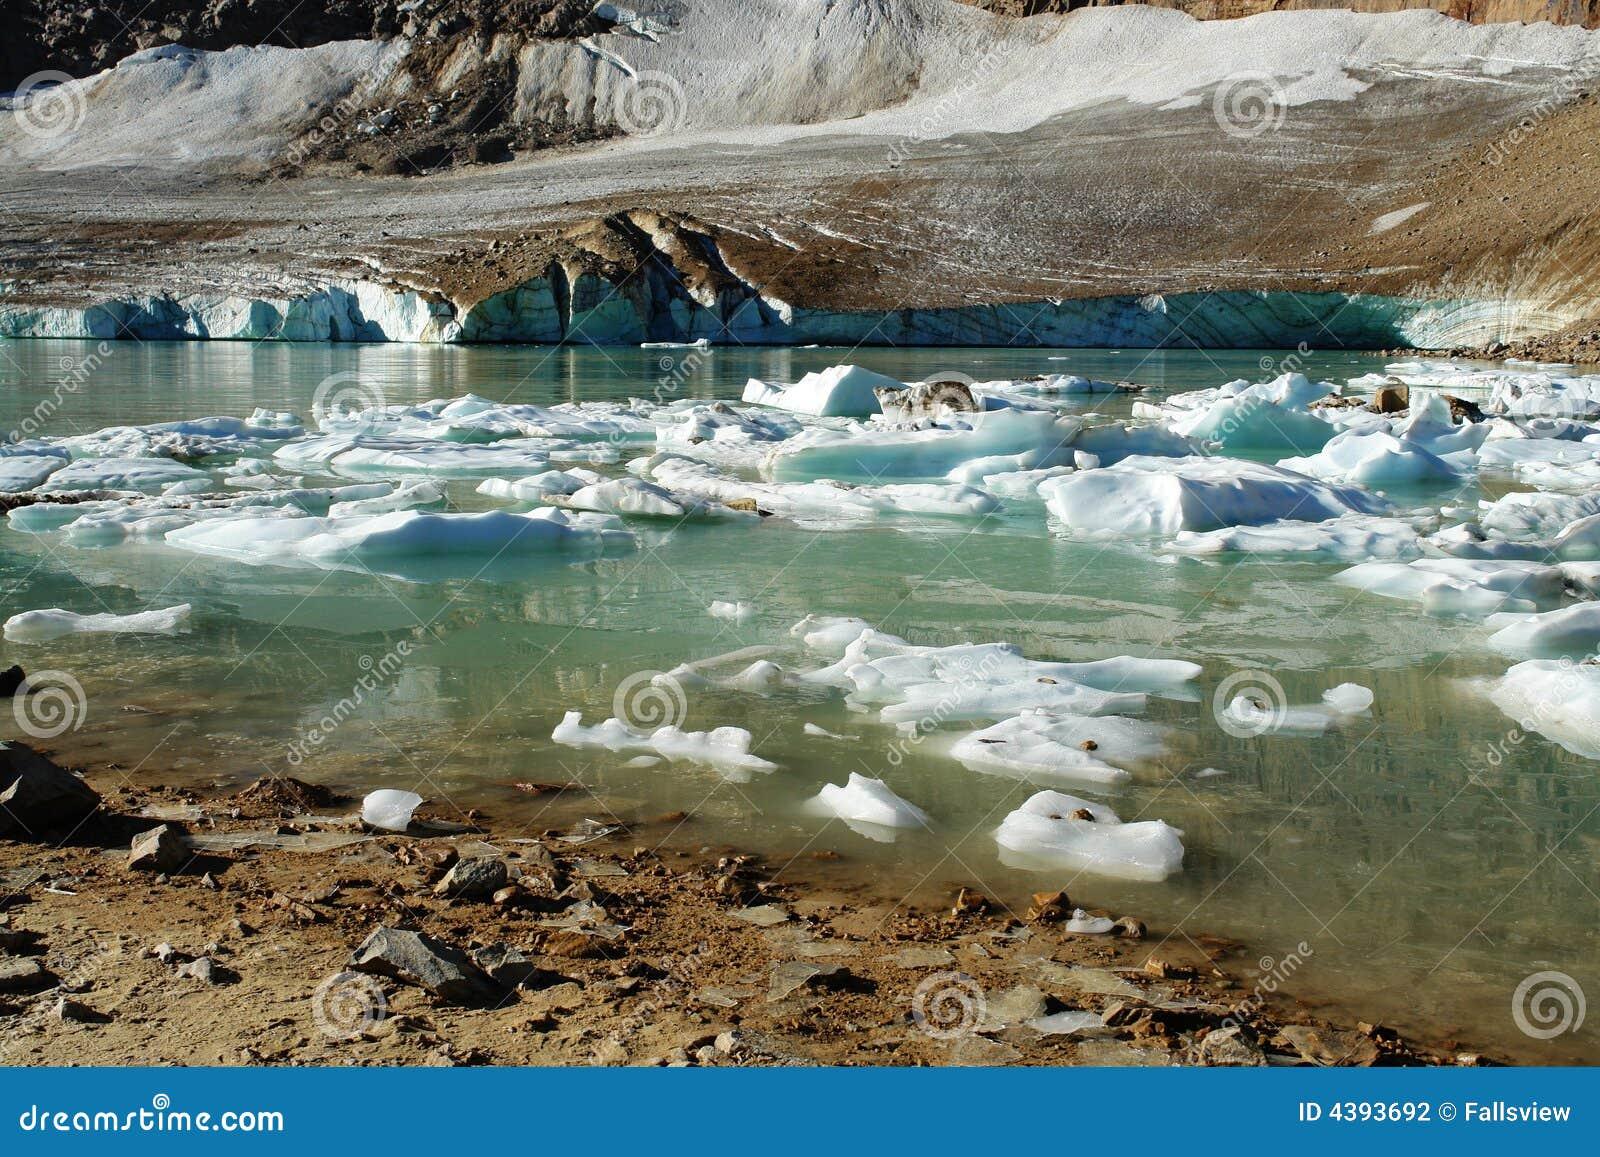 Glacier lake in august